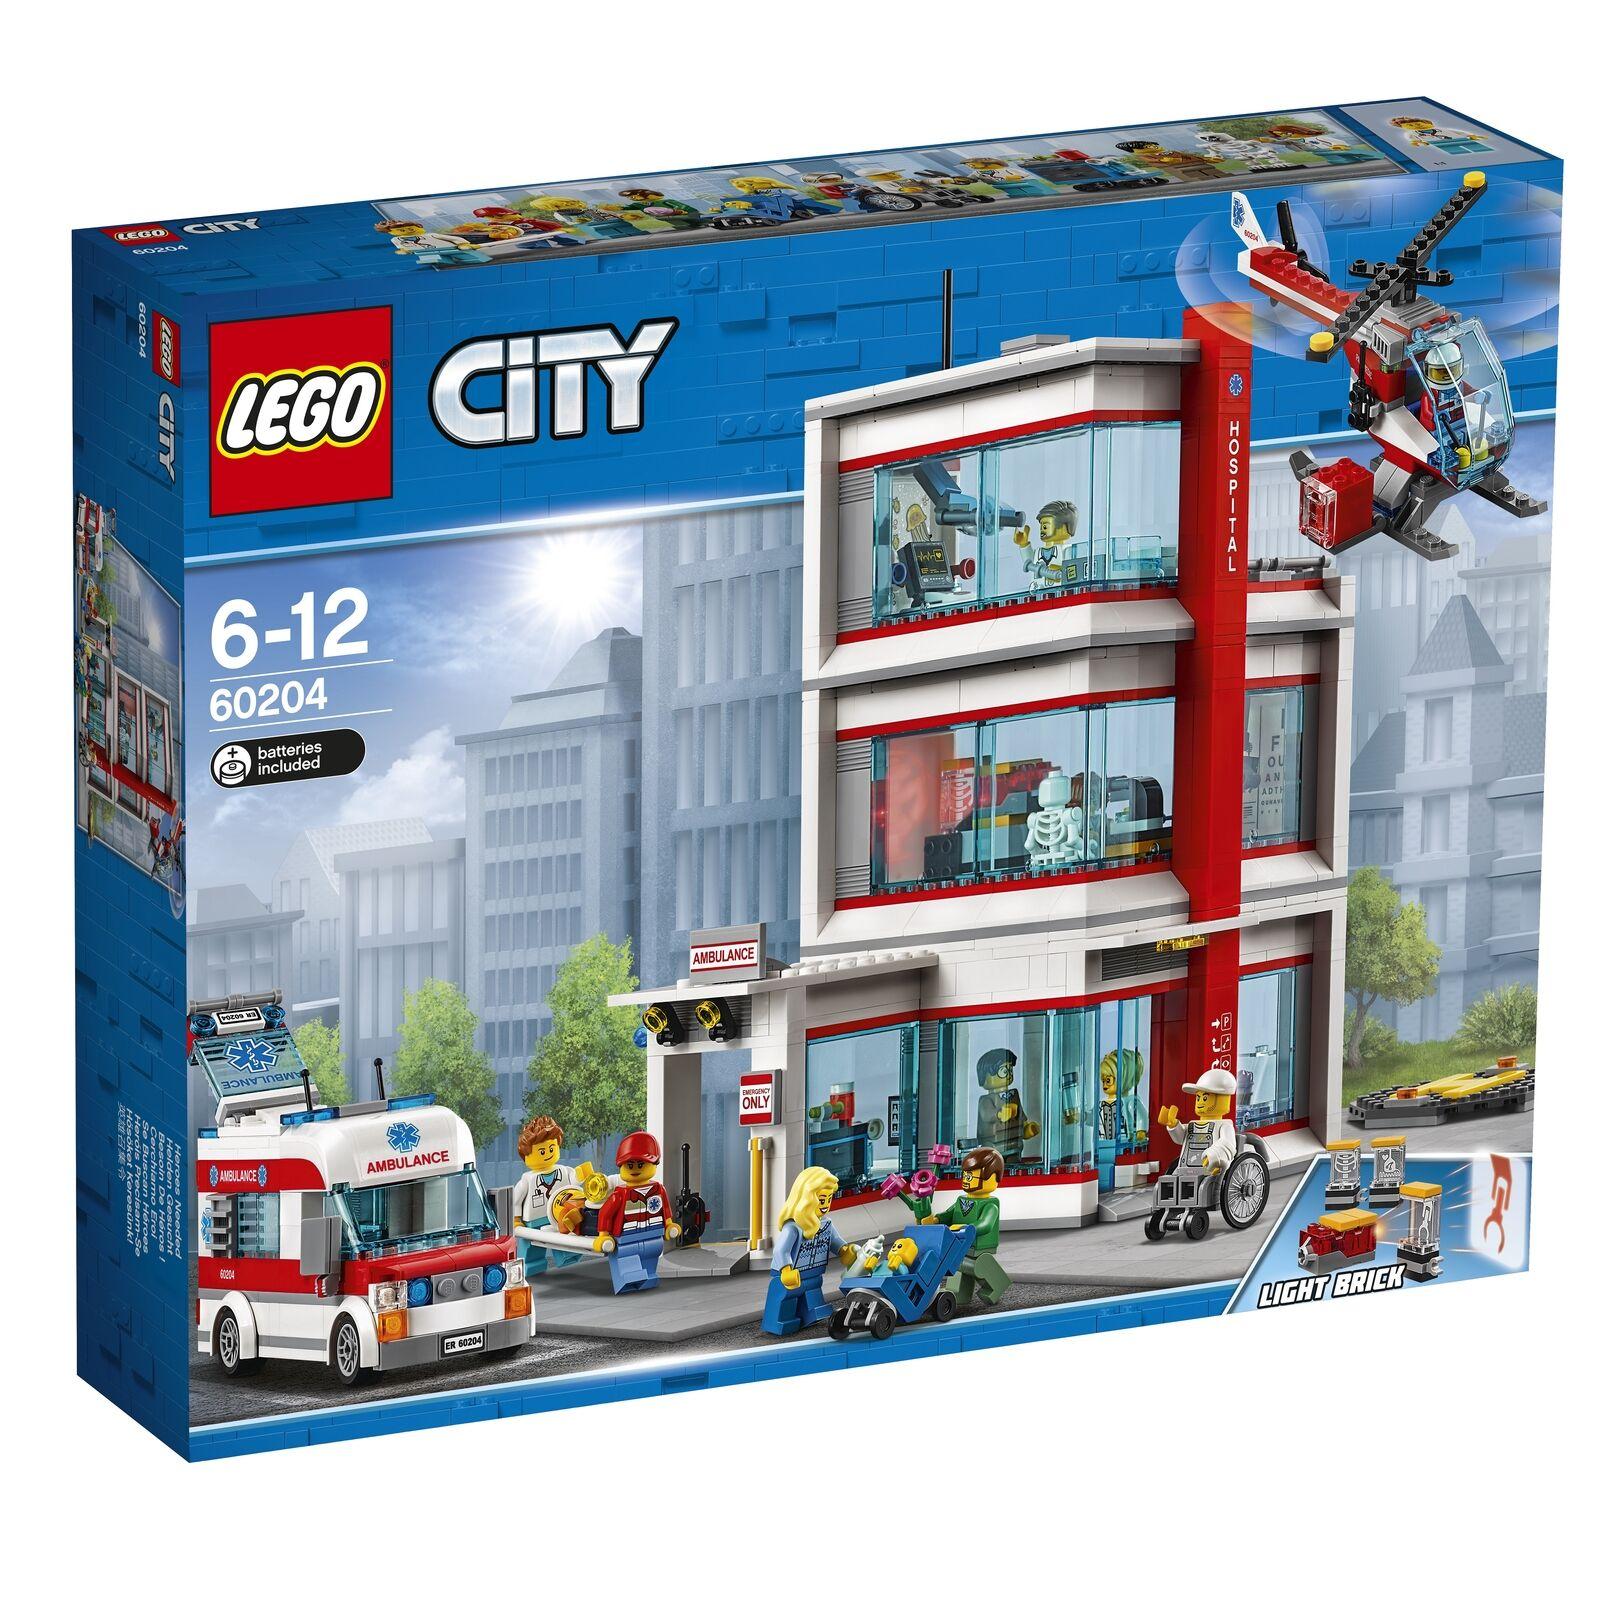 NEW Lego City City Hospital SET 60204 1